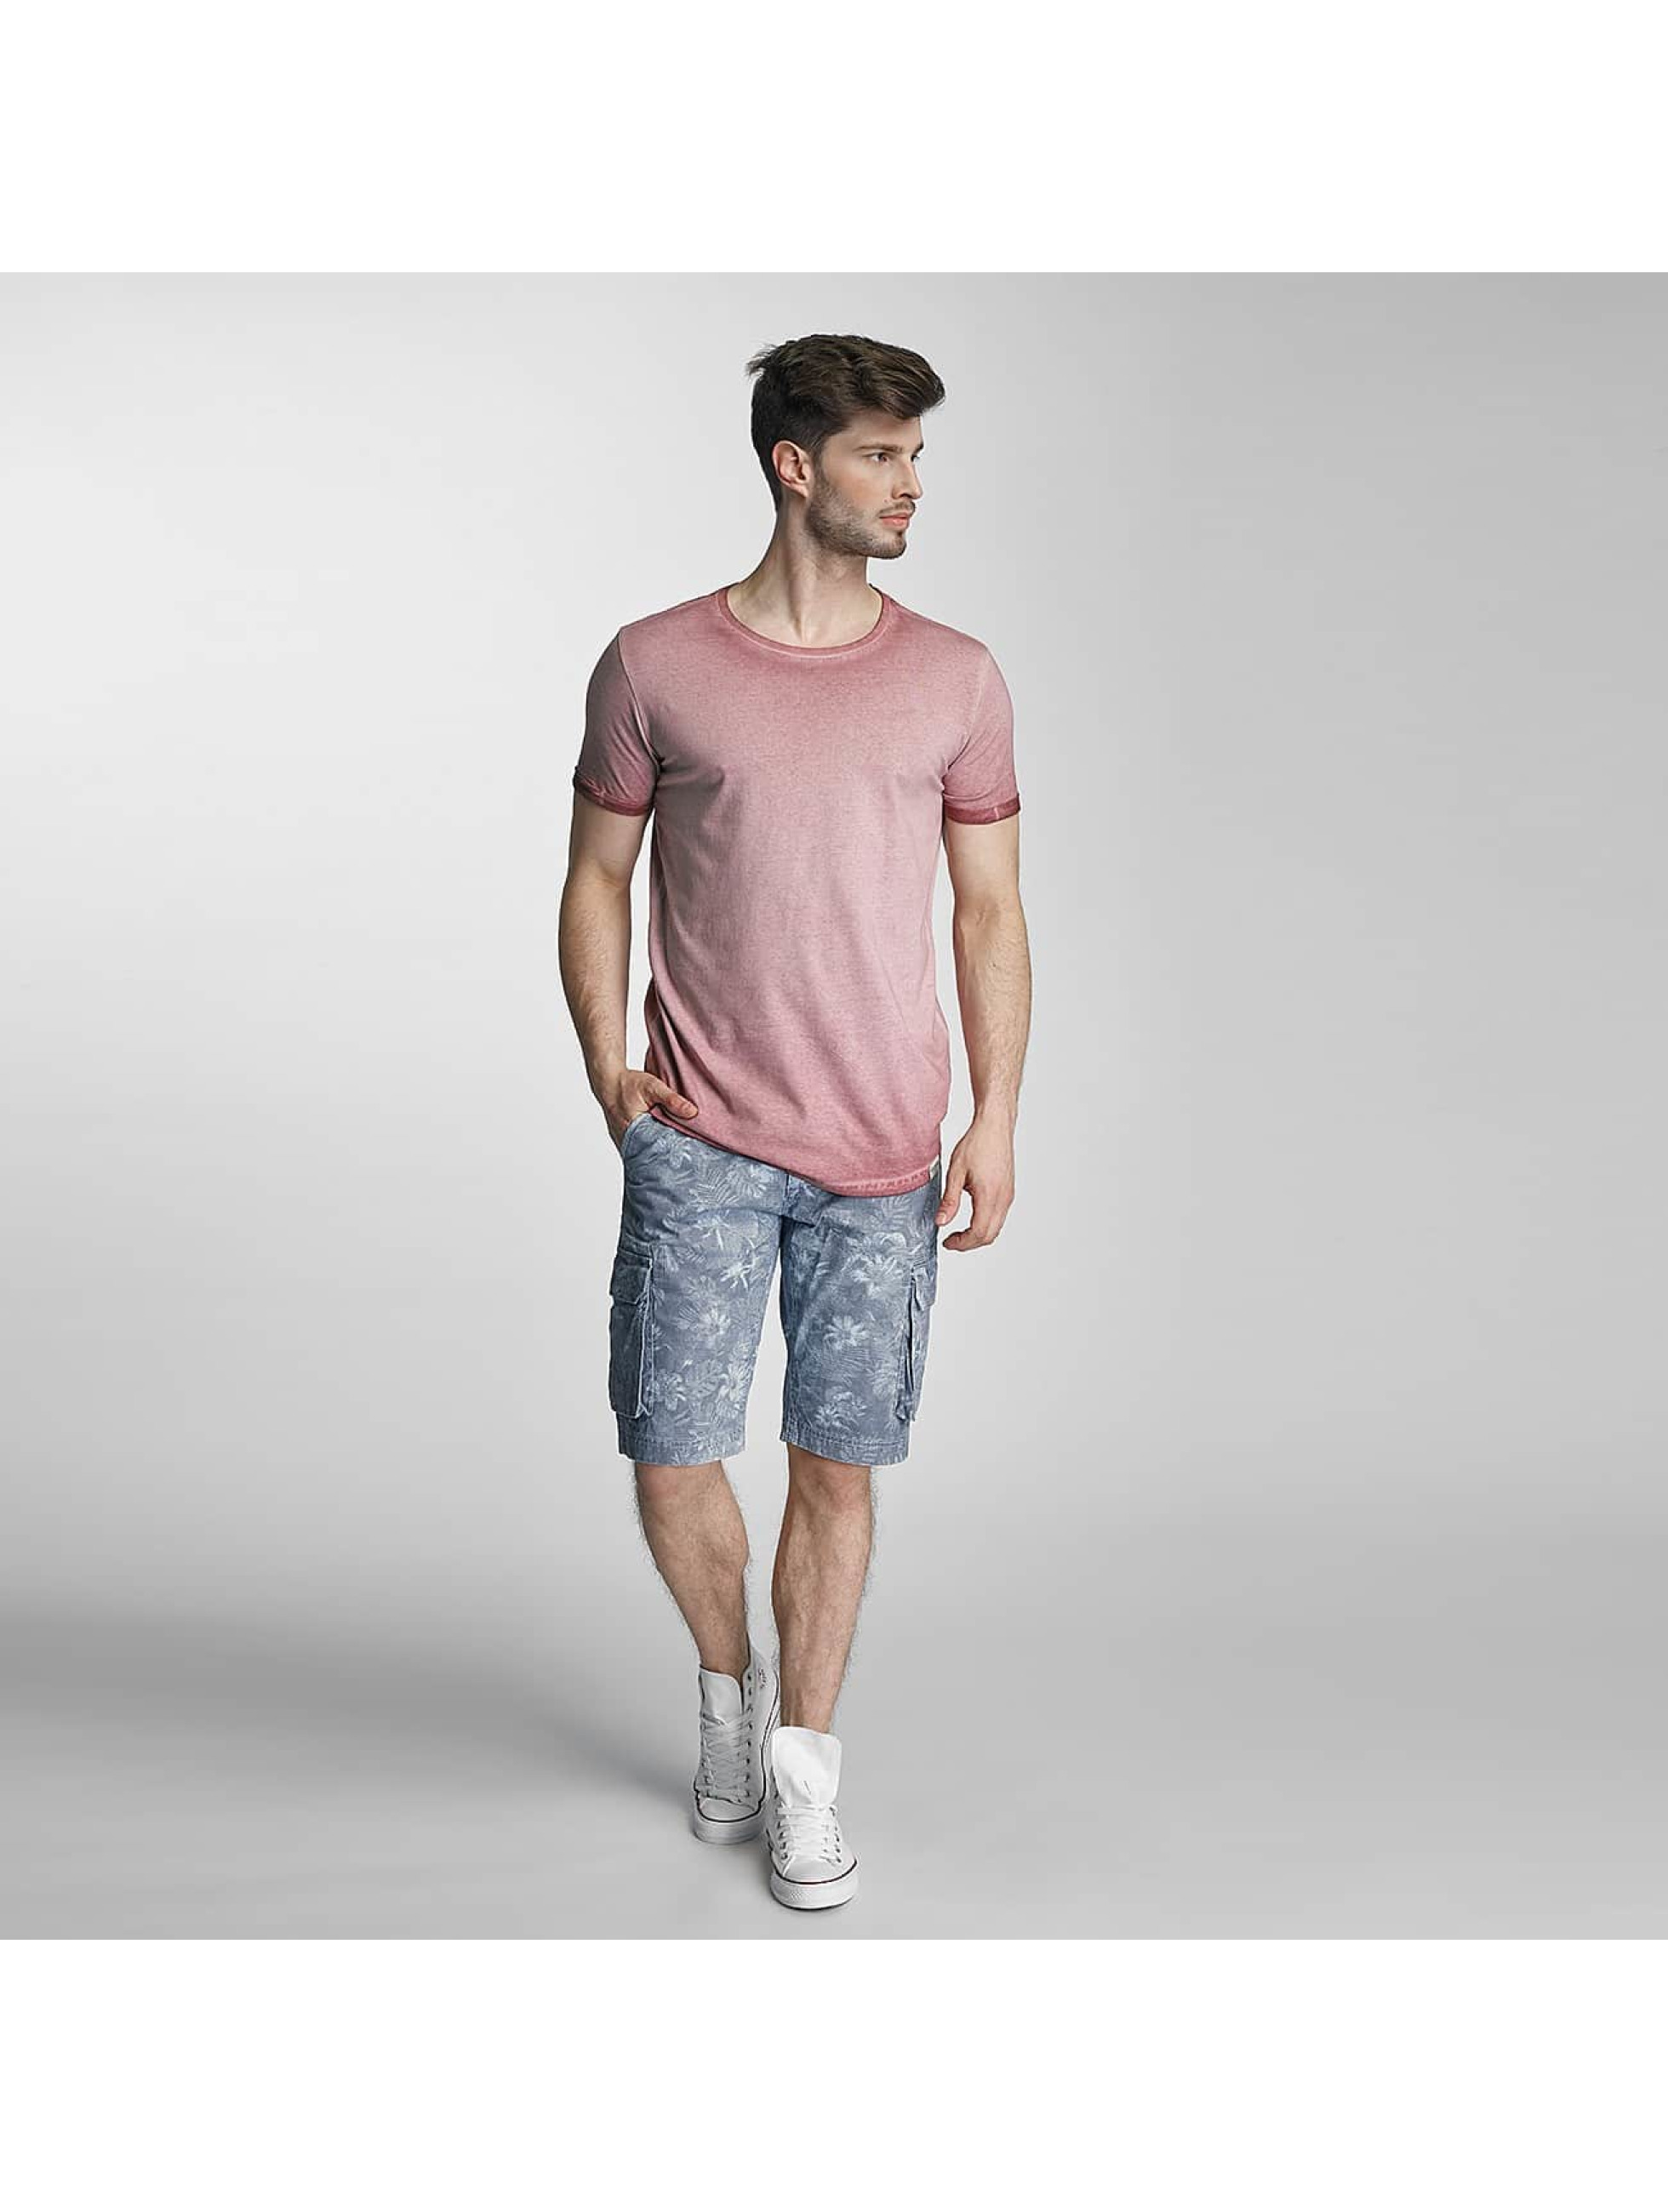 SHINE Original Camiseta Dirt Dye Wash rosa